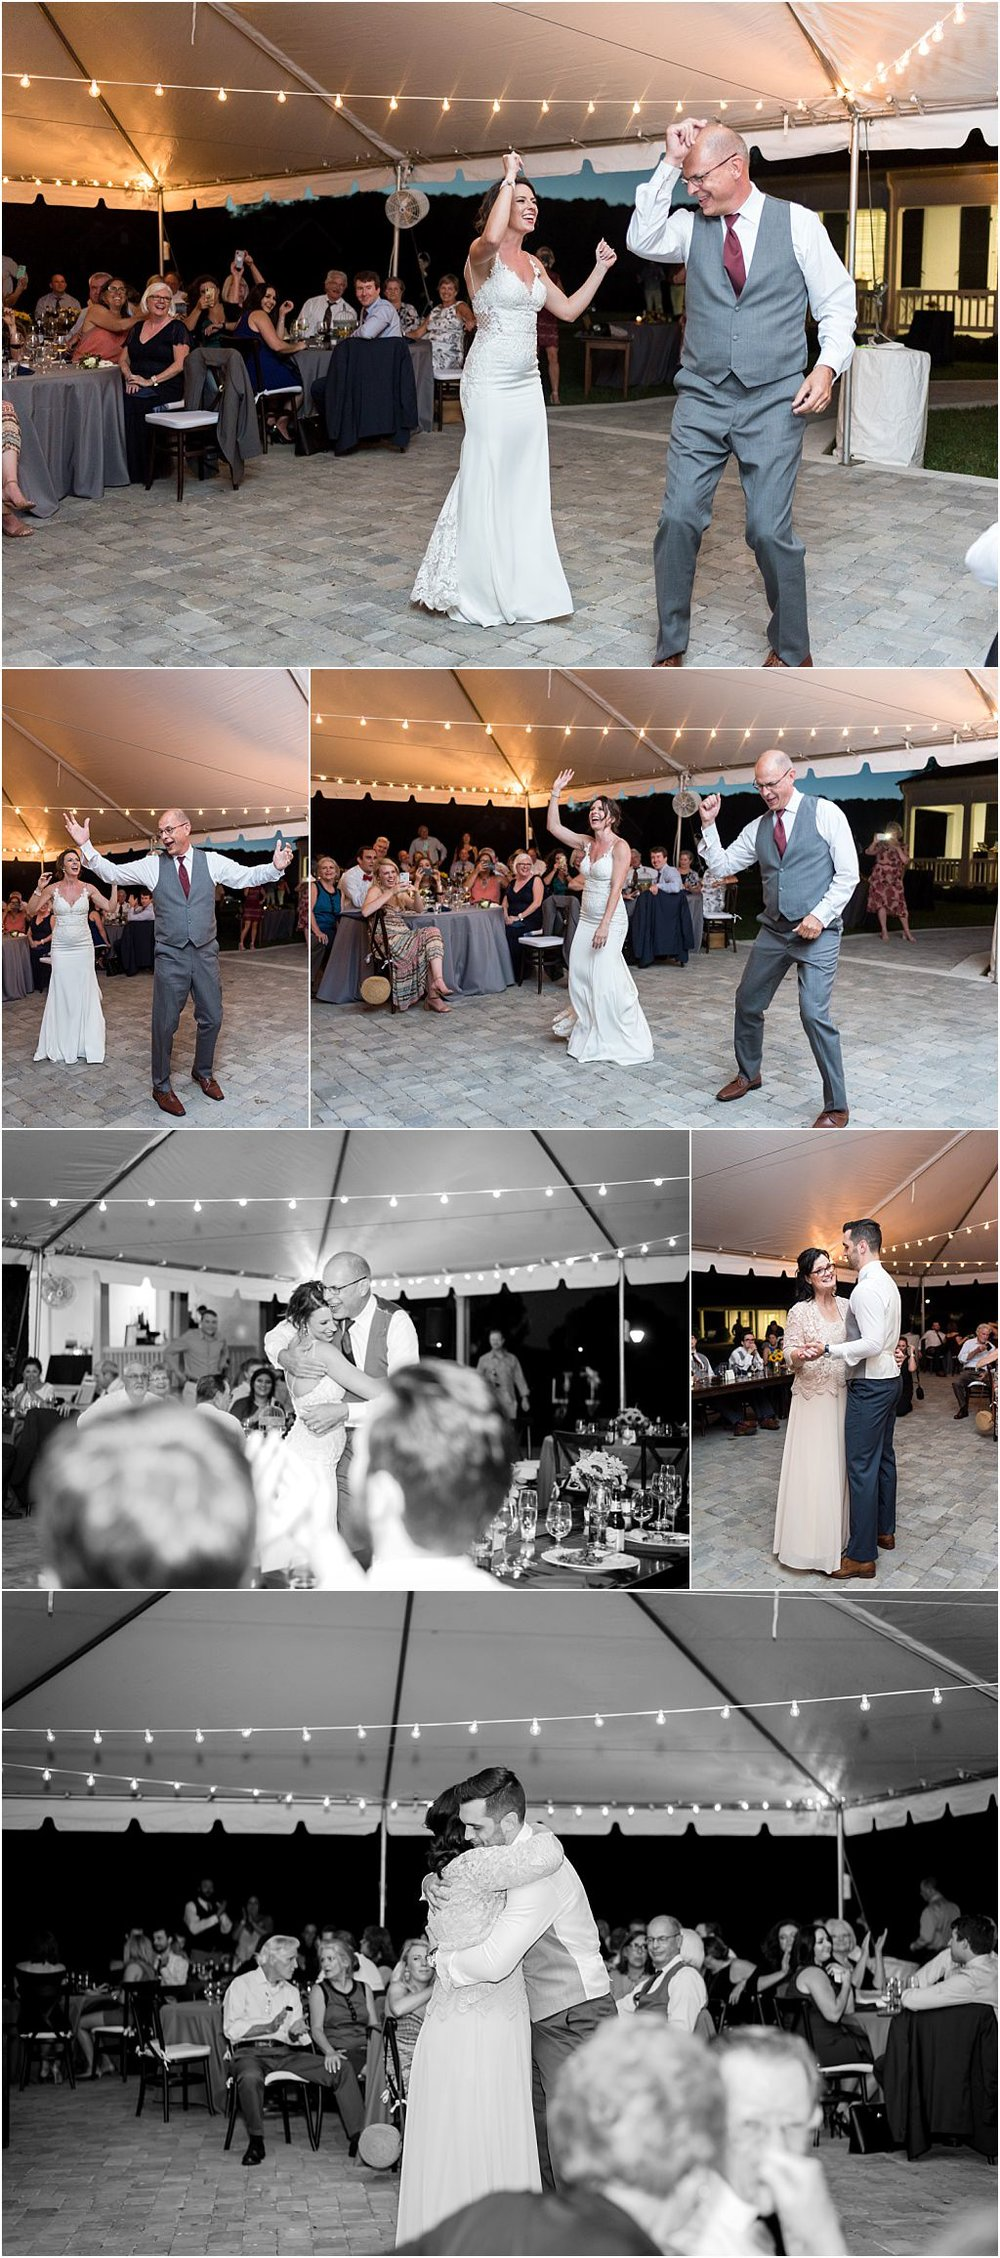 Jordan-and-Anna-Ravenswood-Mansion-Wedding-in-Brentwood-TN-Nashville-Wedding-Photographers+11